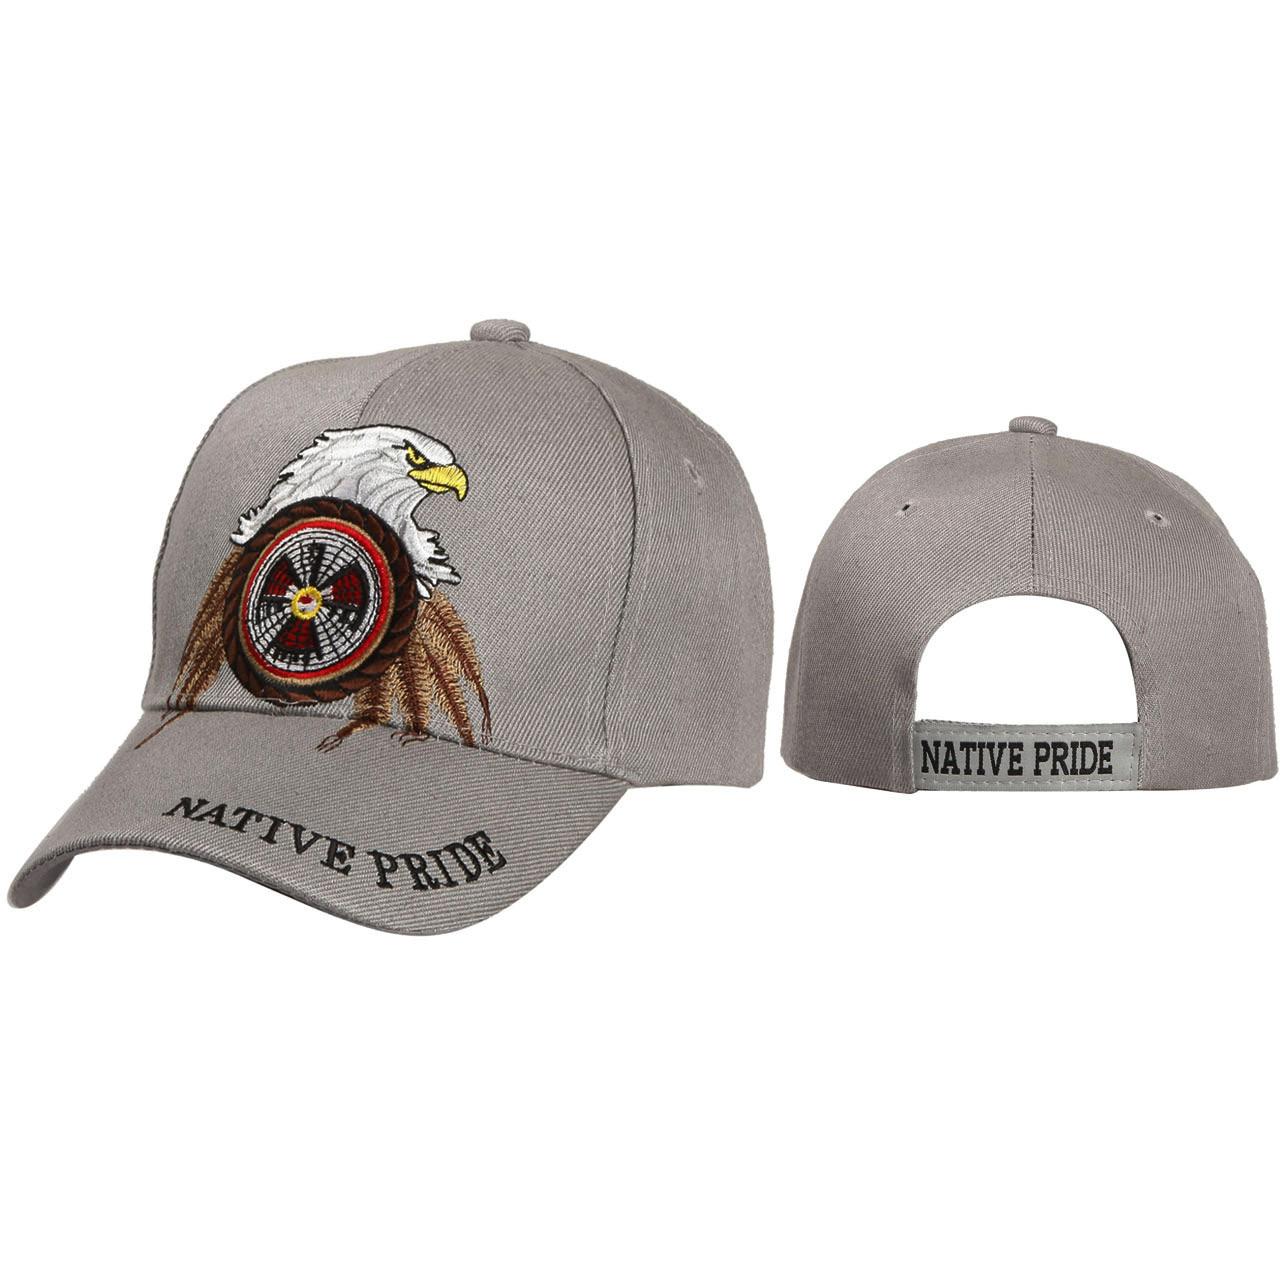 Caps Wholesale ~ Native Pride with Eagle ~ Grey